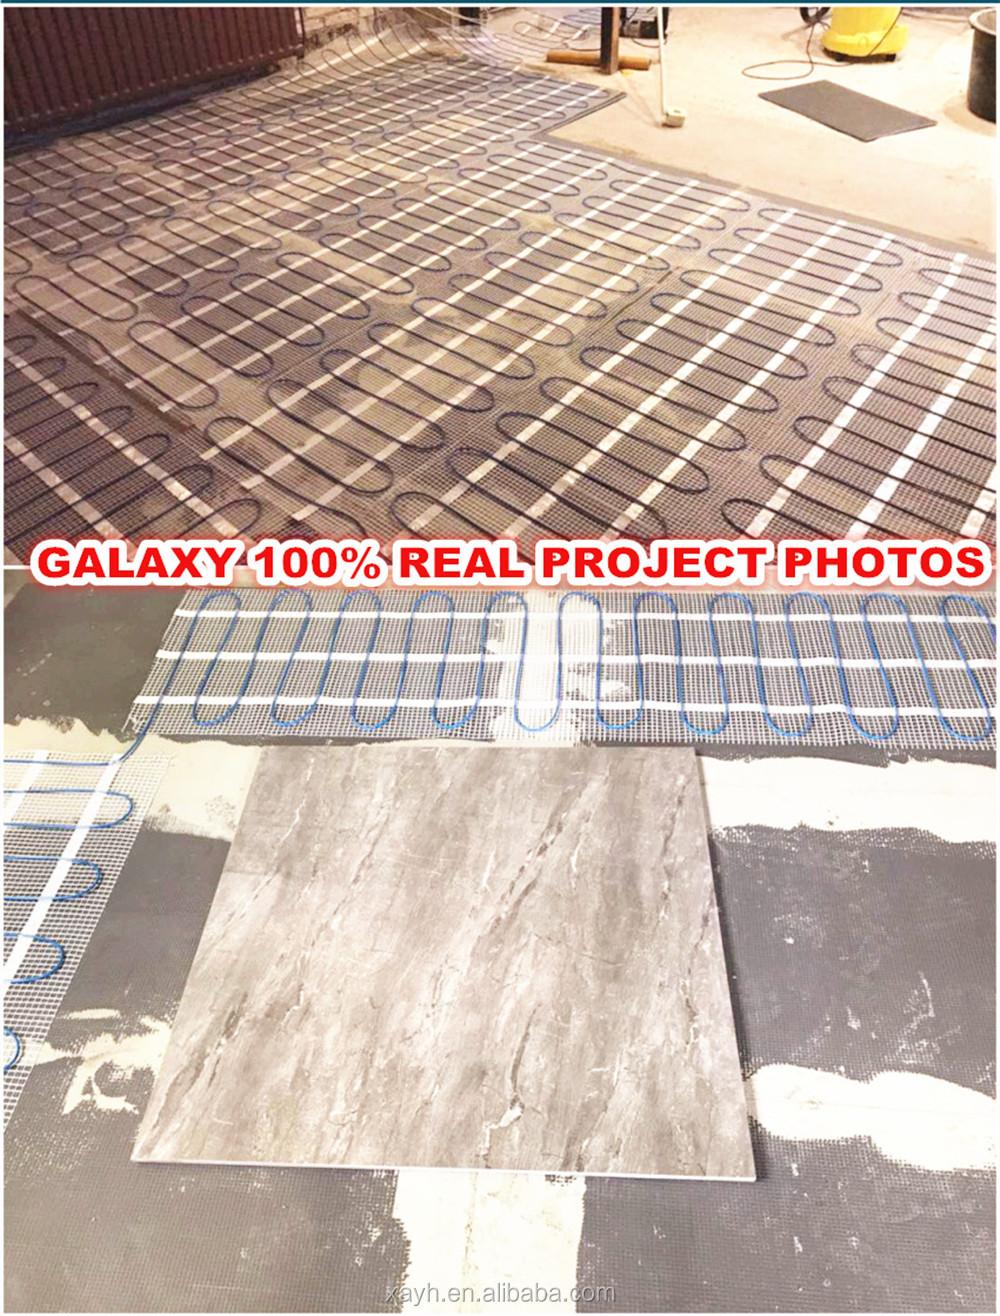 Beautiful Elektrische Fußbodenheizung Hersteller Photos ...